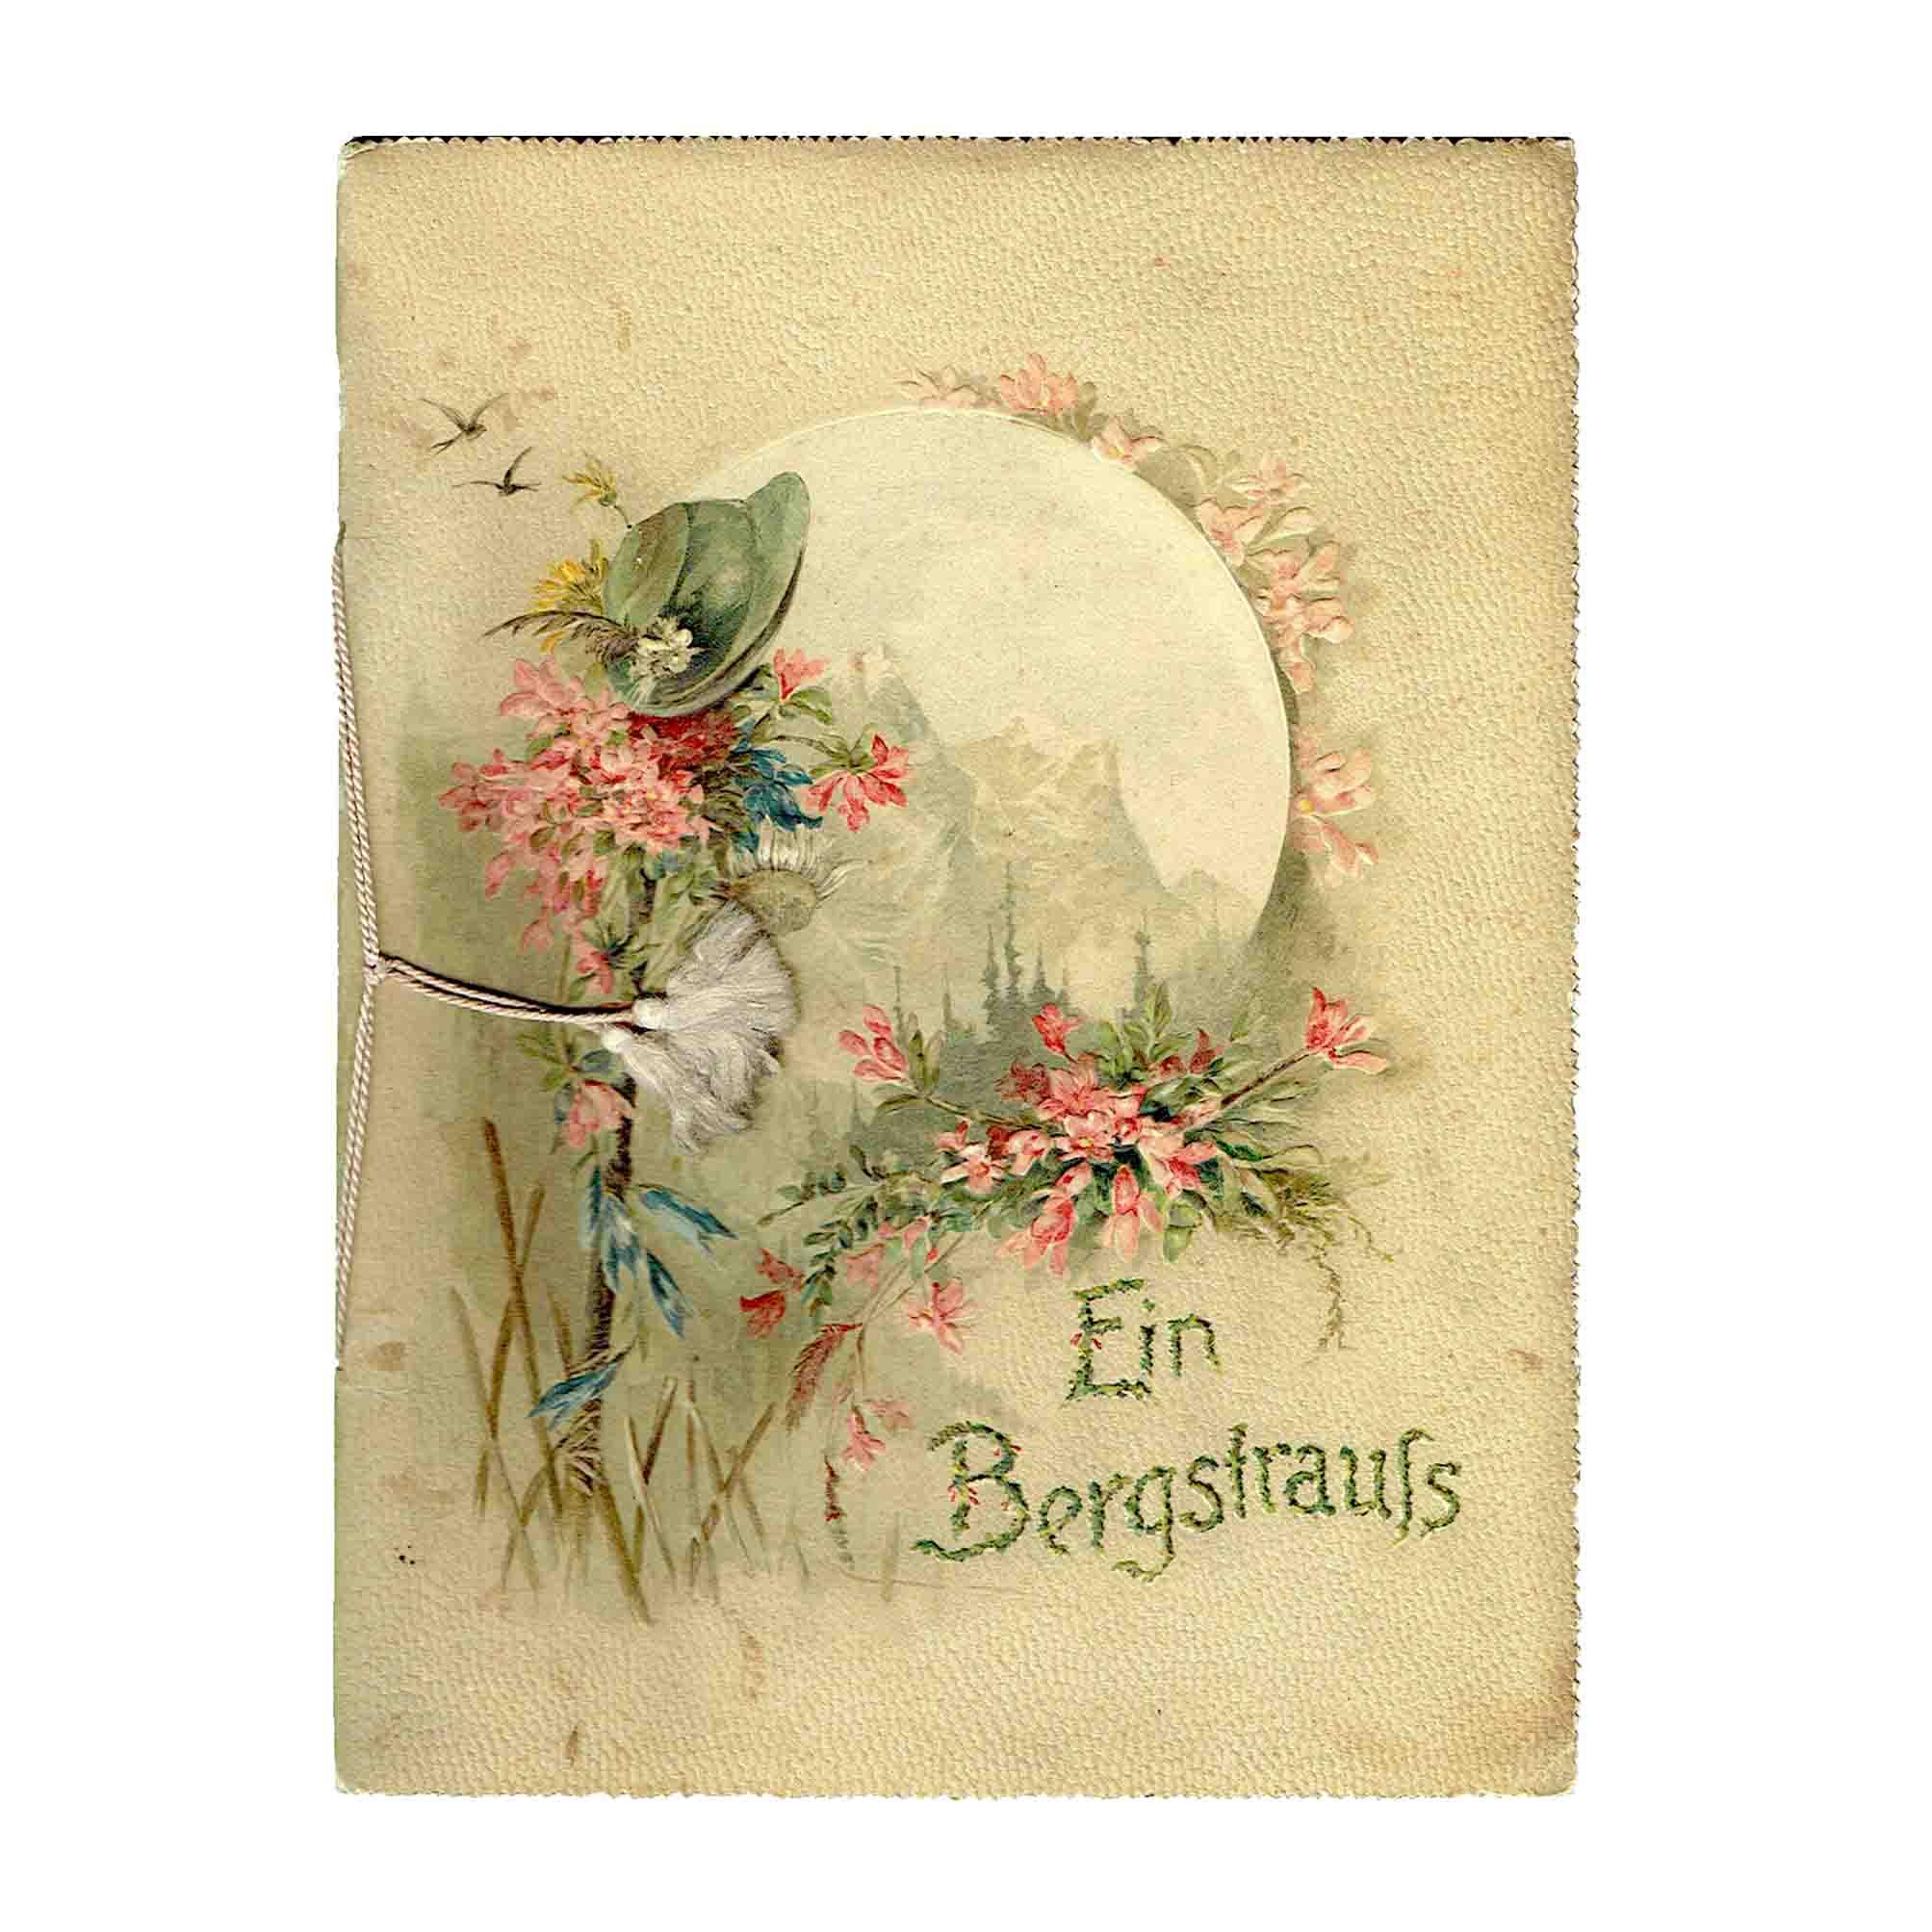 5798-Mayer-Bergwald-Nikitini-Bergstrauss-1898-Einband-frei-2-N.jpeg